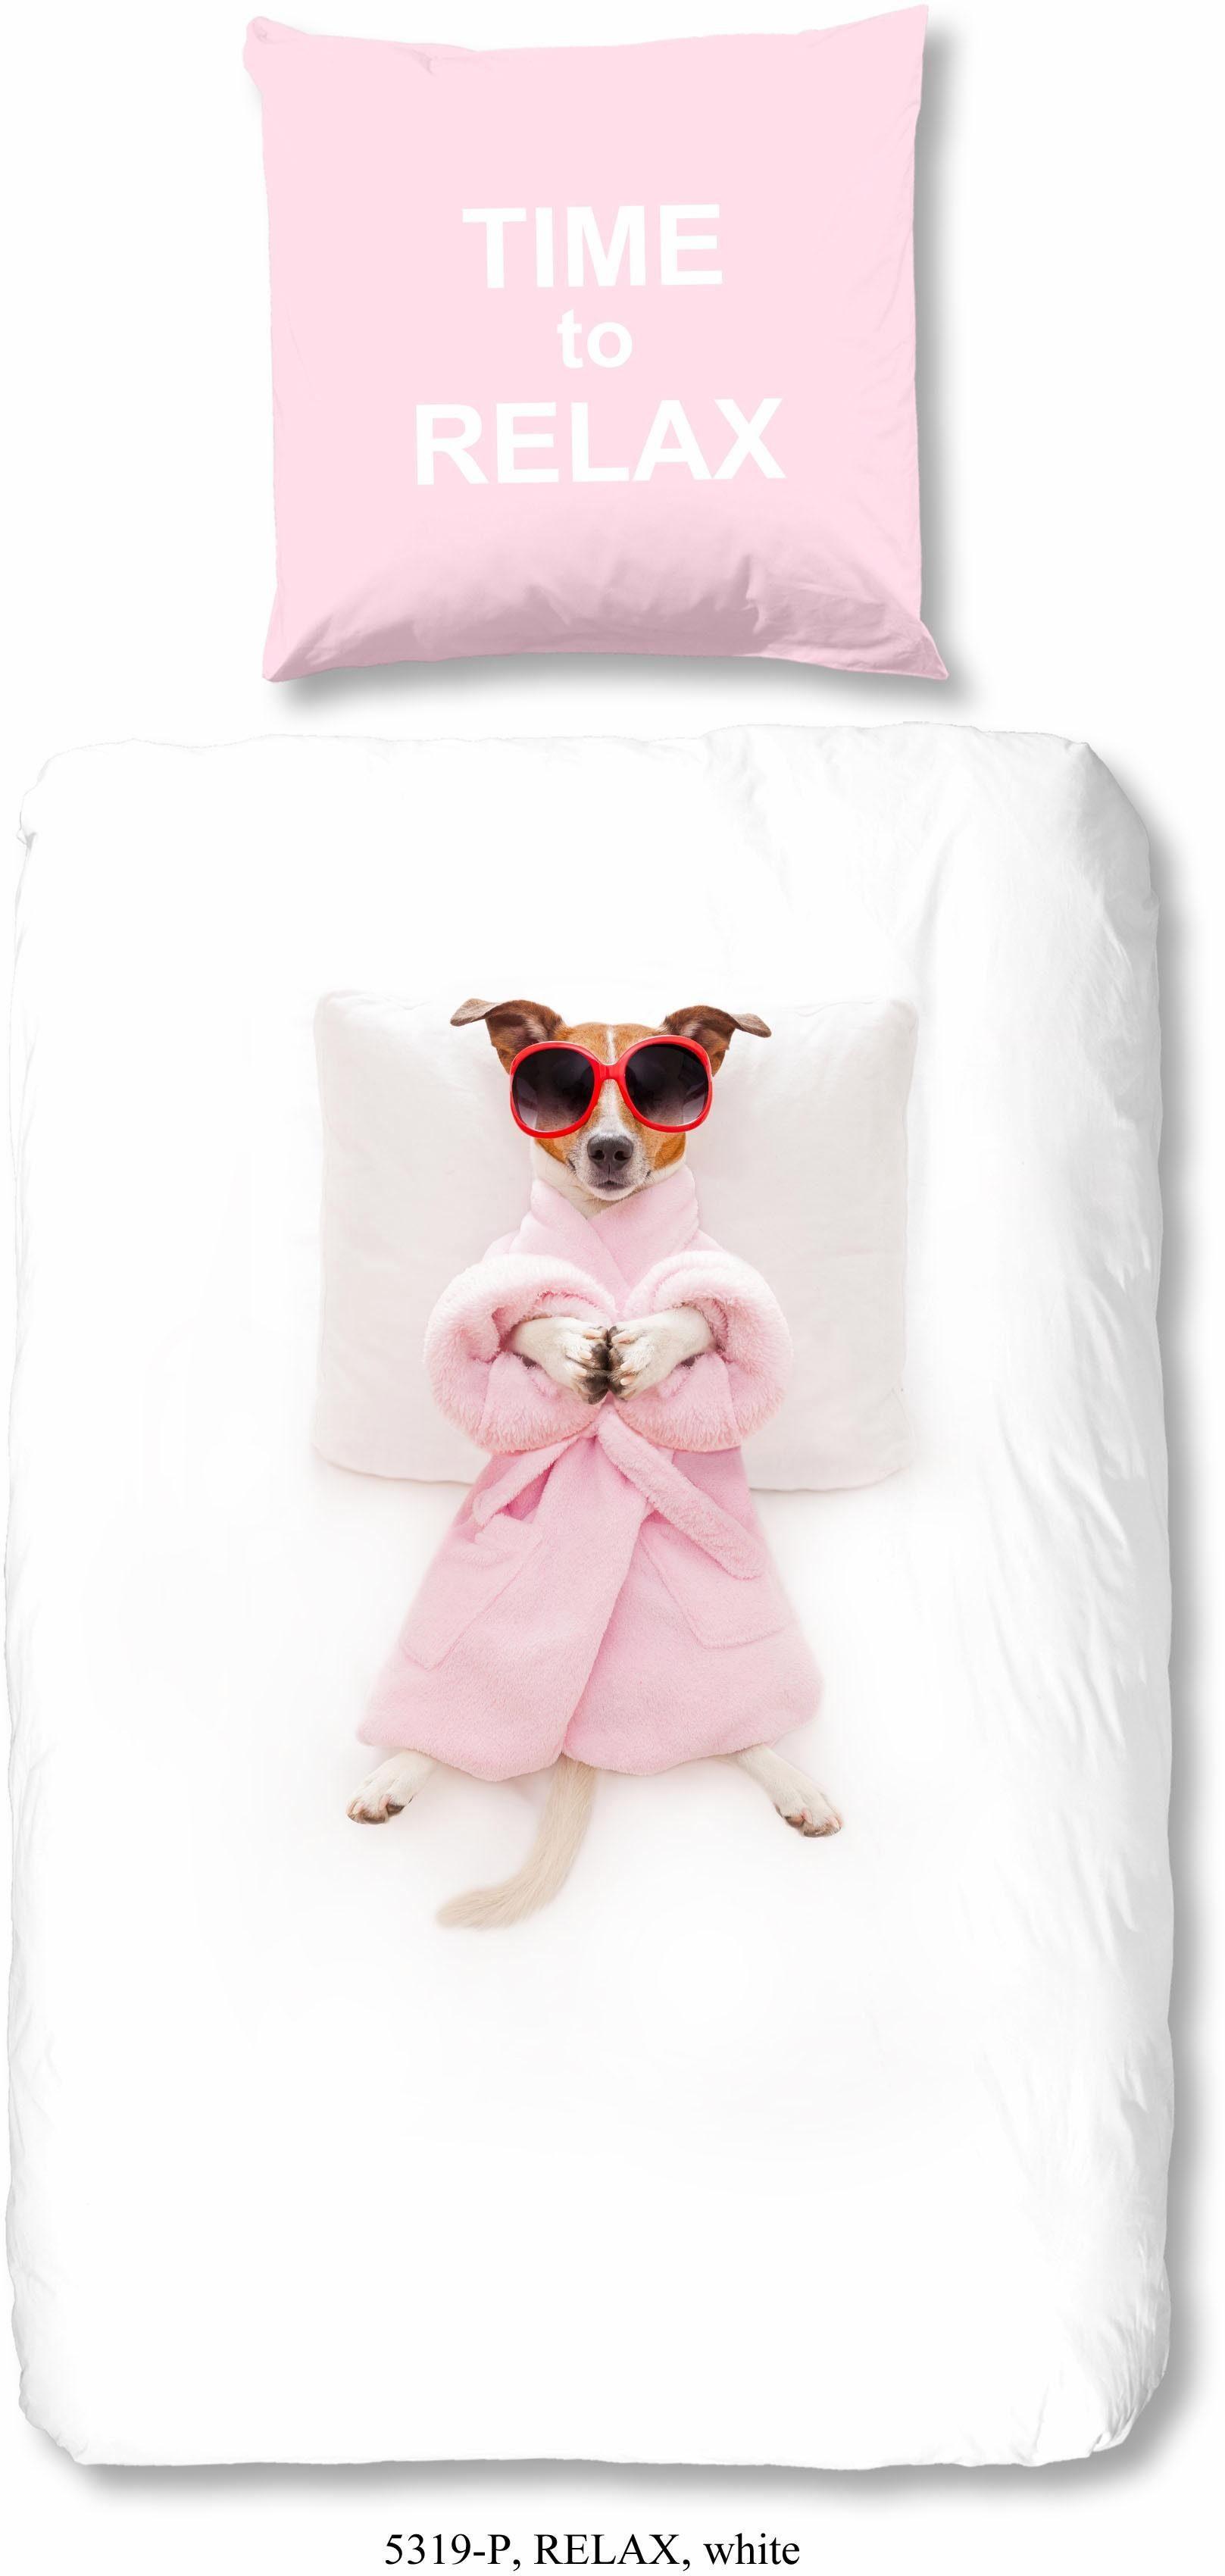 Kinderbettwäsche »Relax«, good morning, mit Hundemotiv